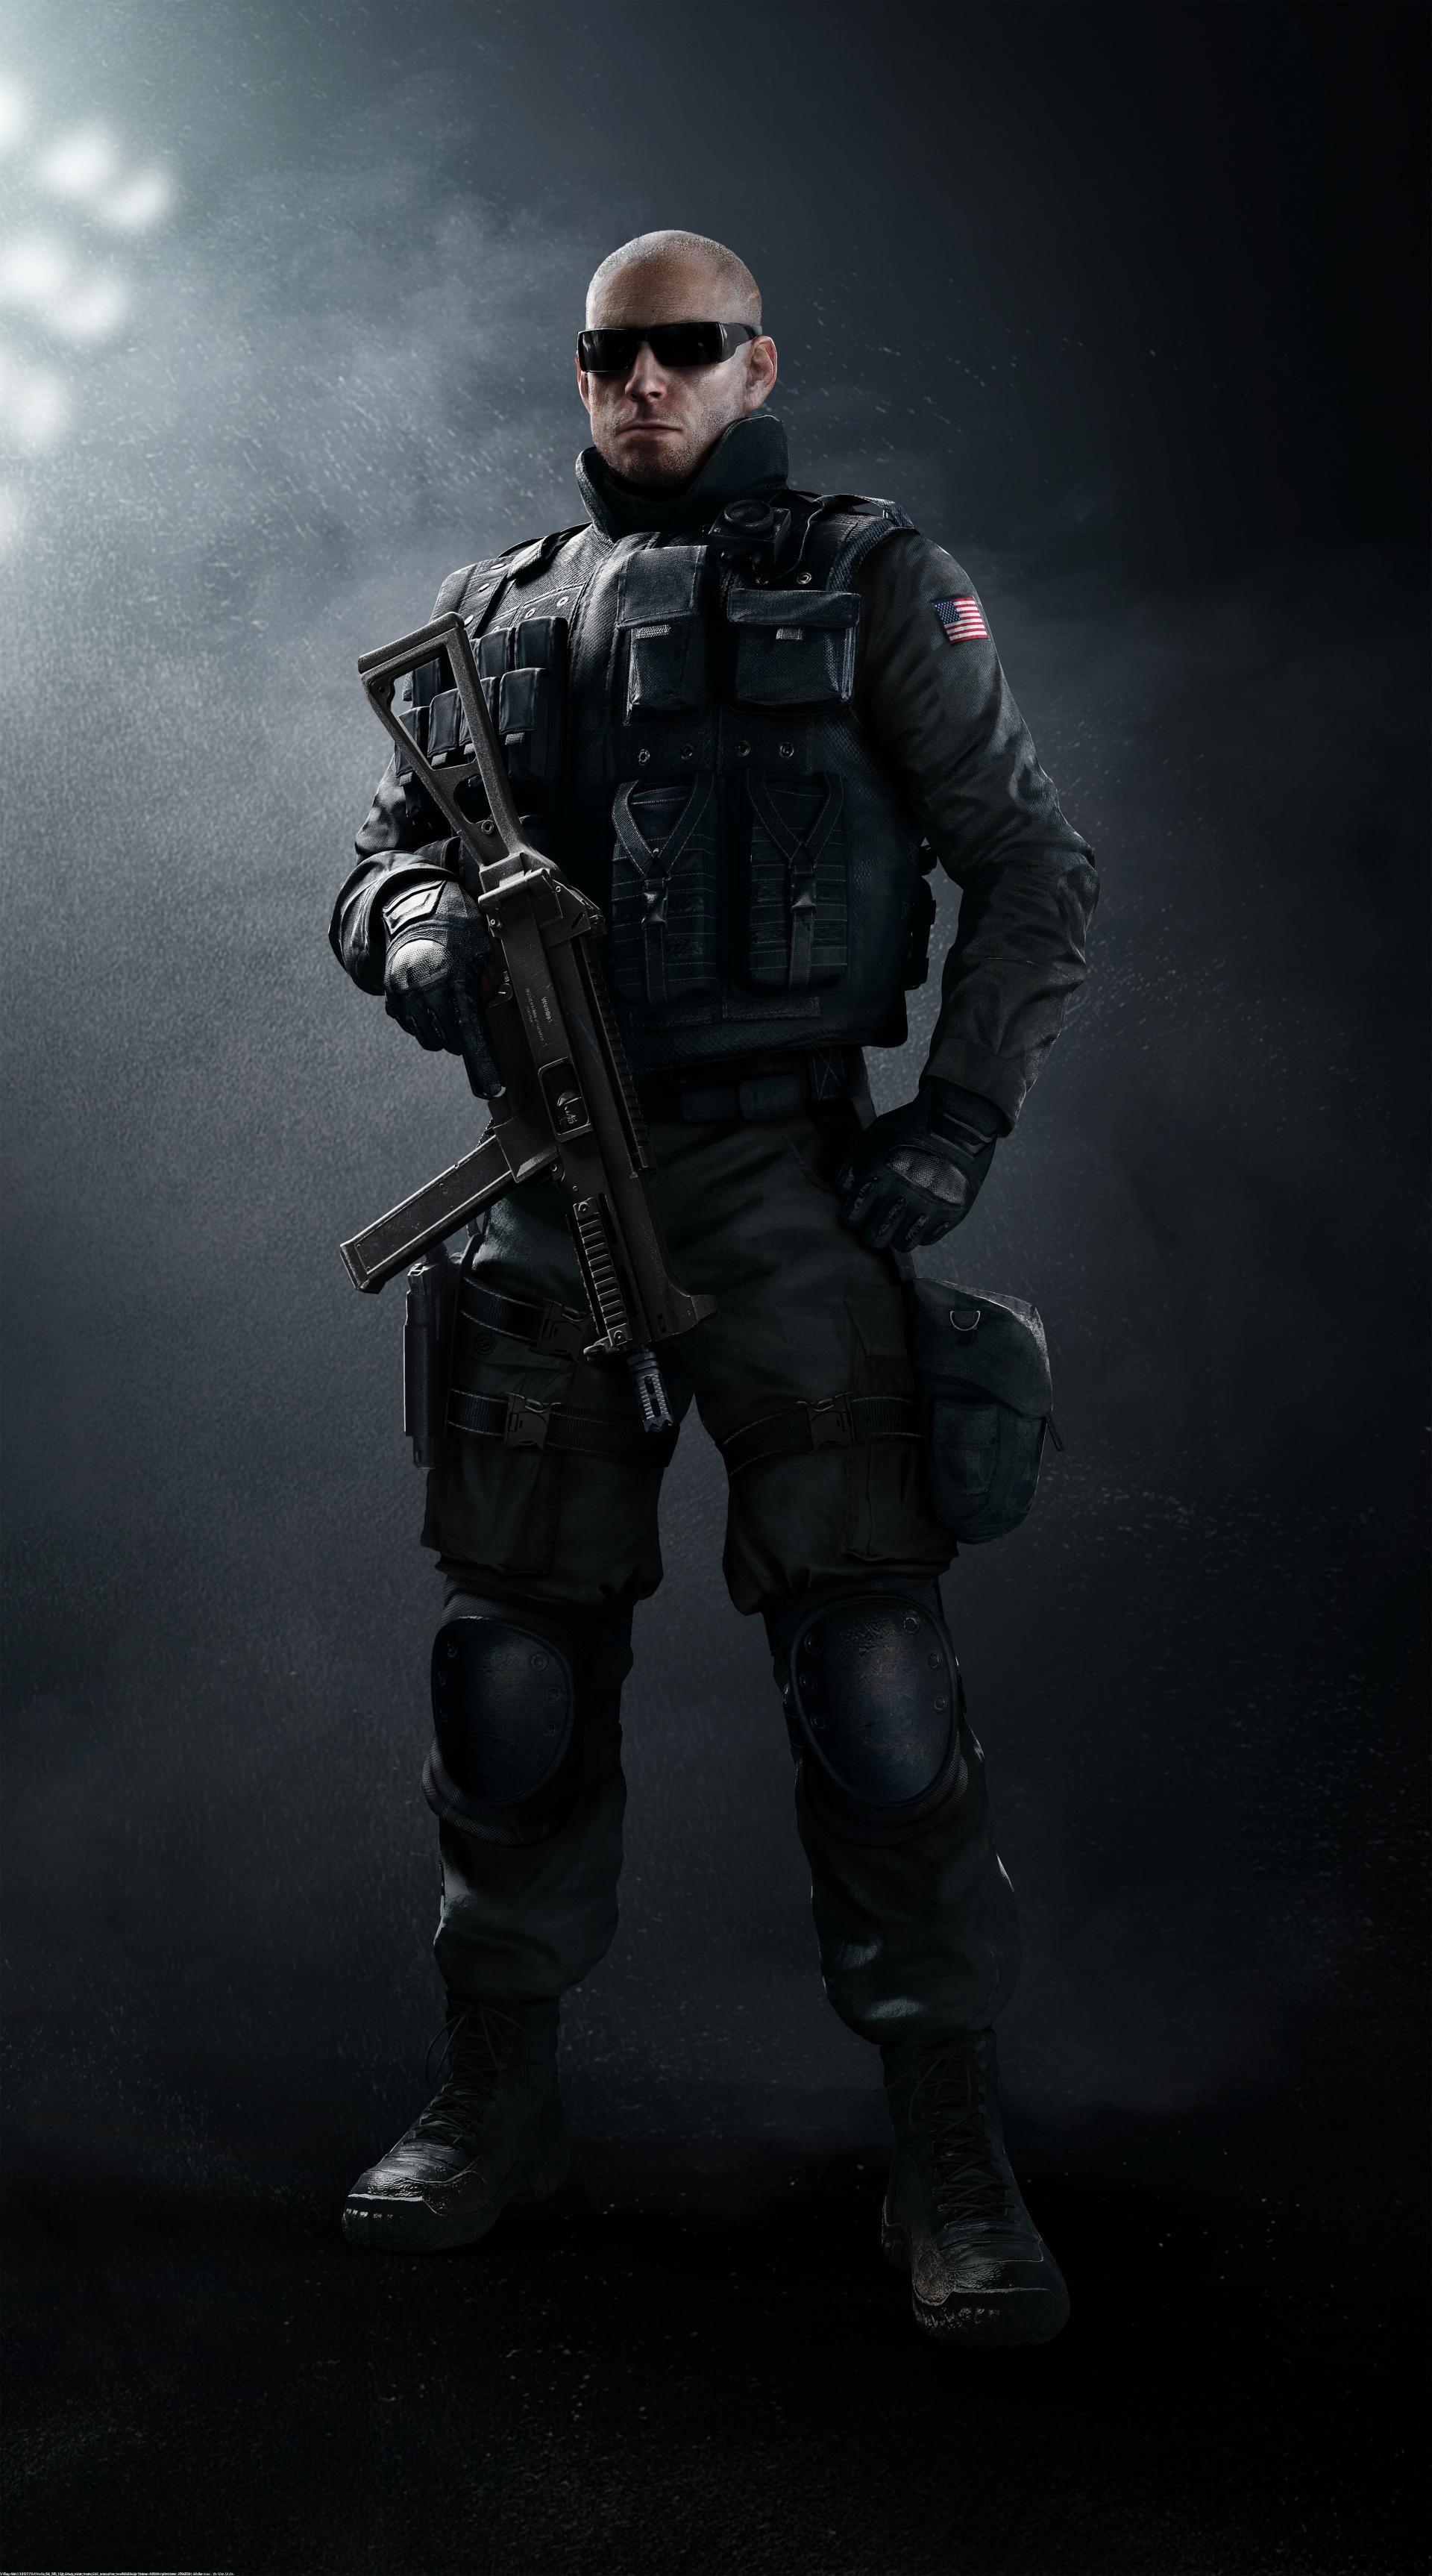 Rainbow Siege GSG Operator Guide Blitz IQ Jager Bandit